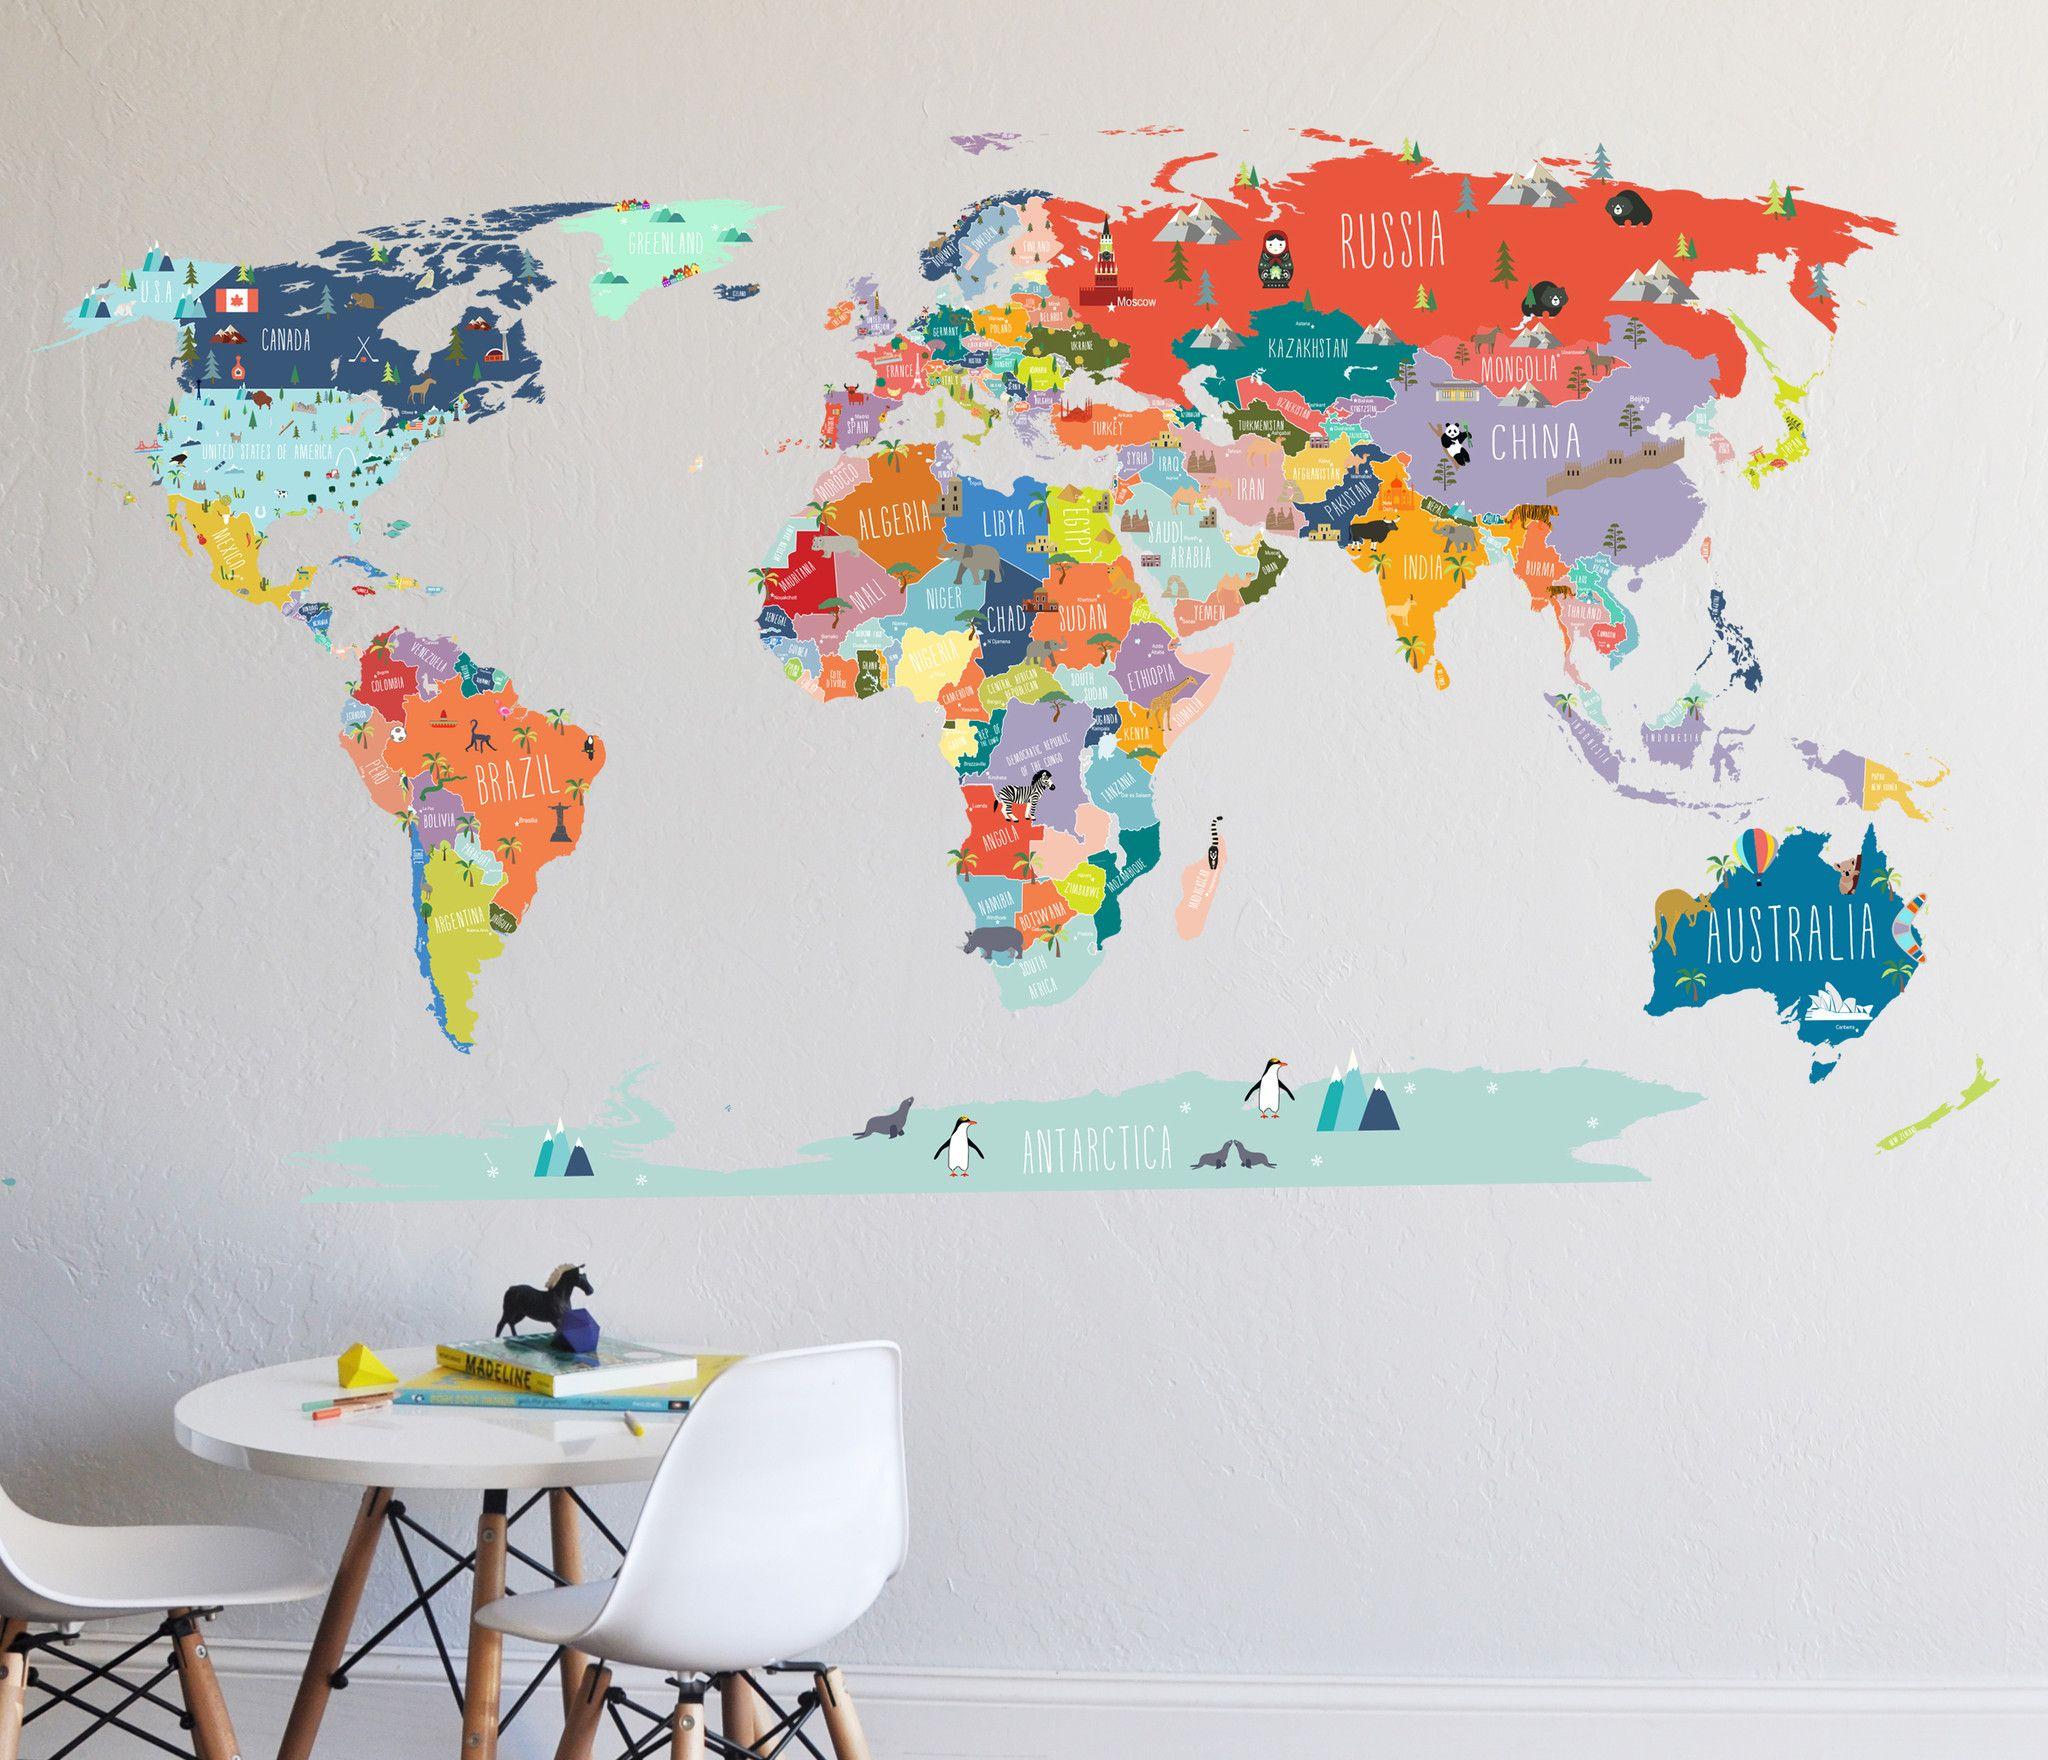 Interactive World Map Wandtattoo weltkarte, Weltkarte